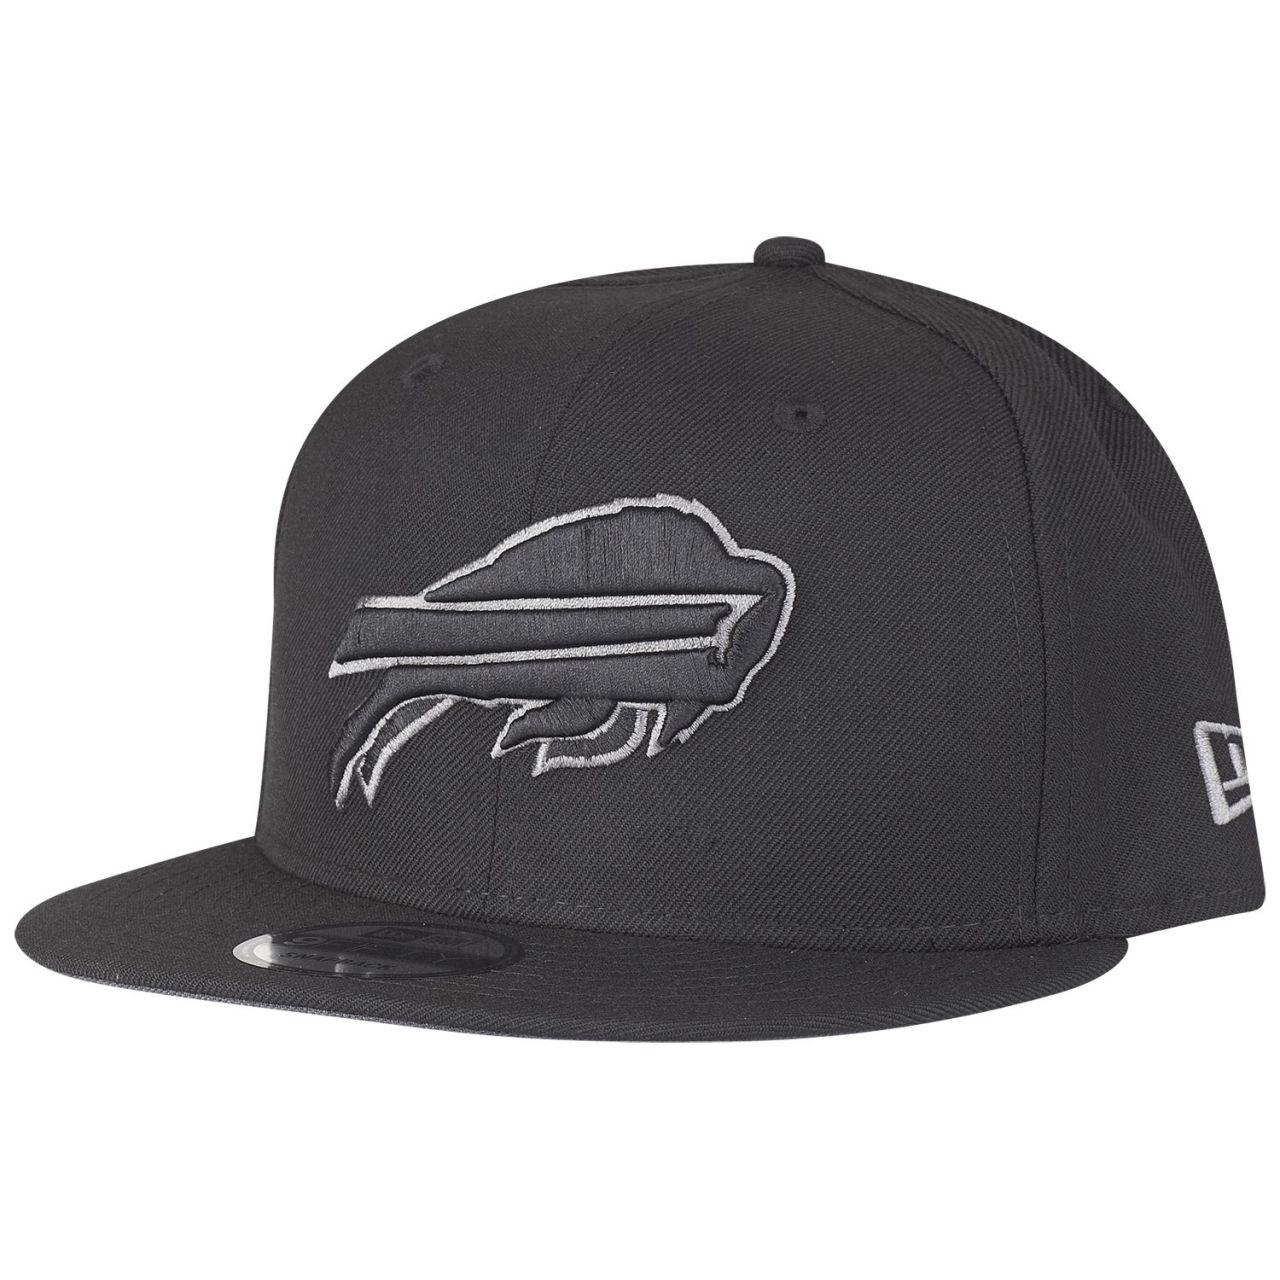 New Era 9Fifty Snapback Cap - Buffalo Bills schwarz / grau